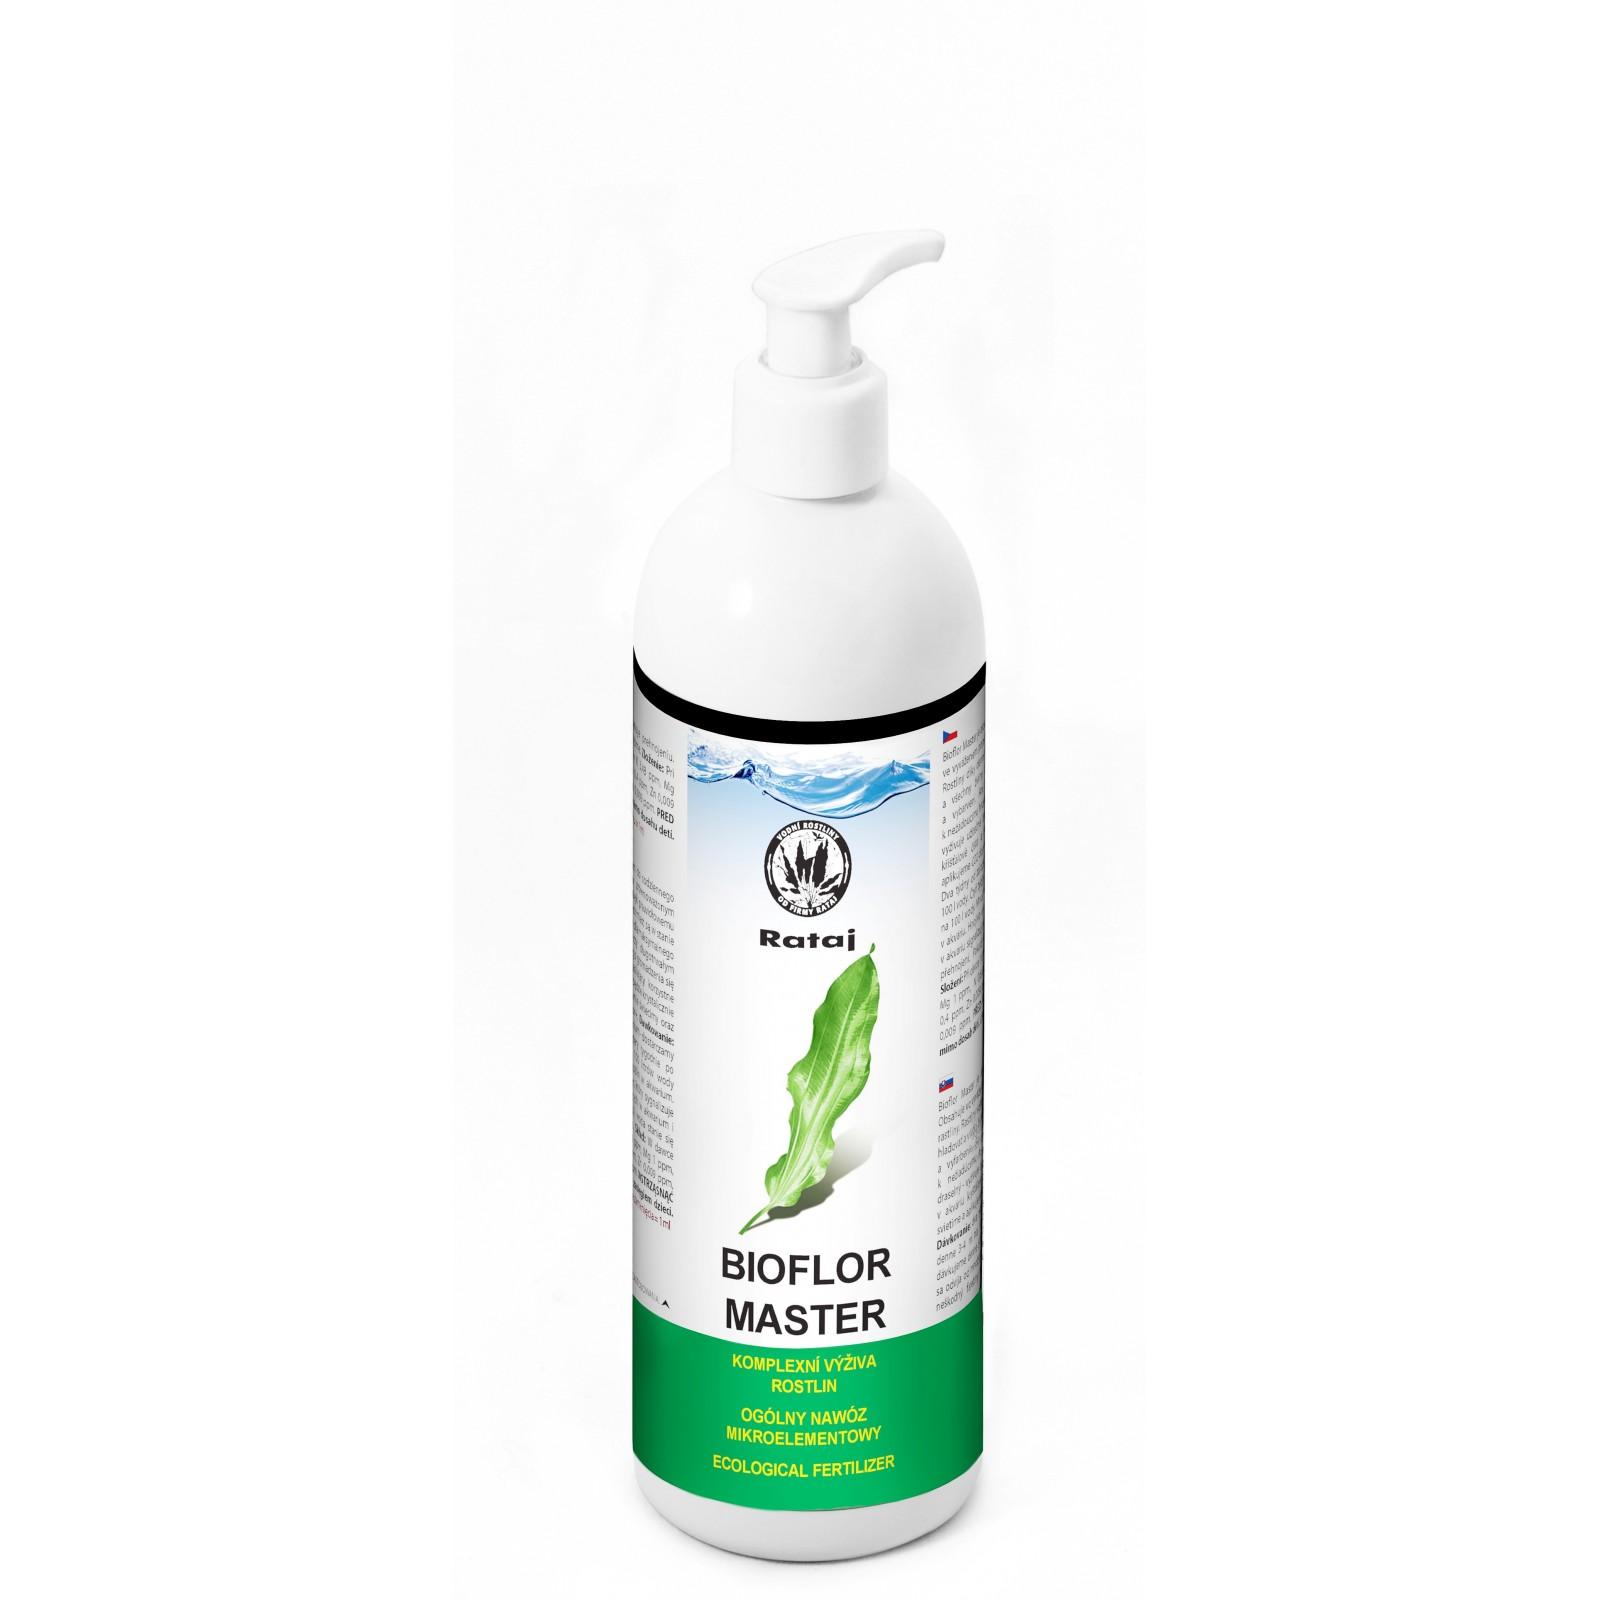 Bioflor MASTER, Objem 130 ml